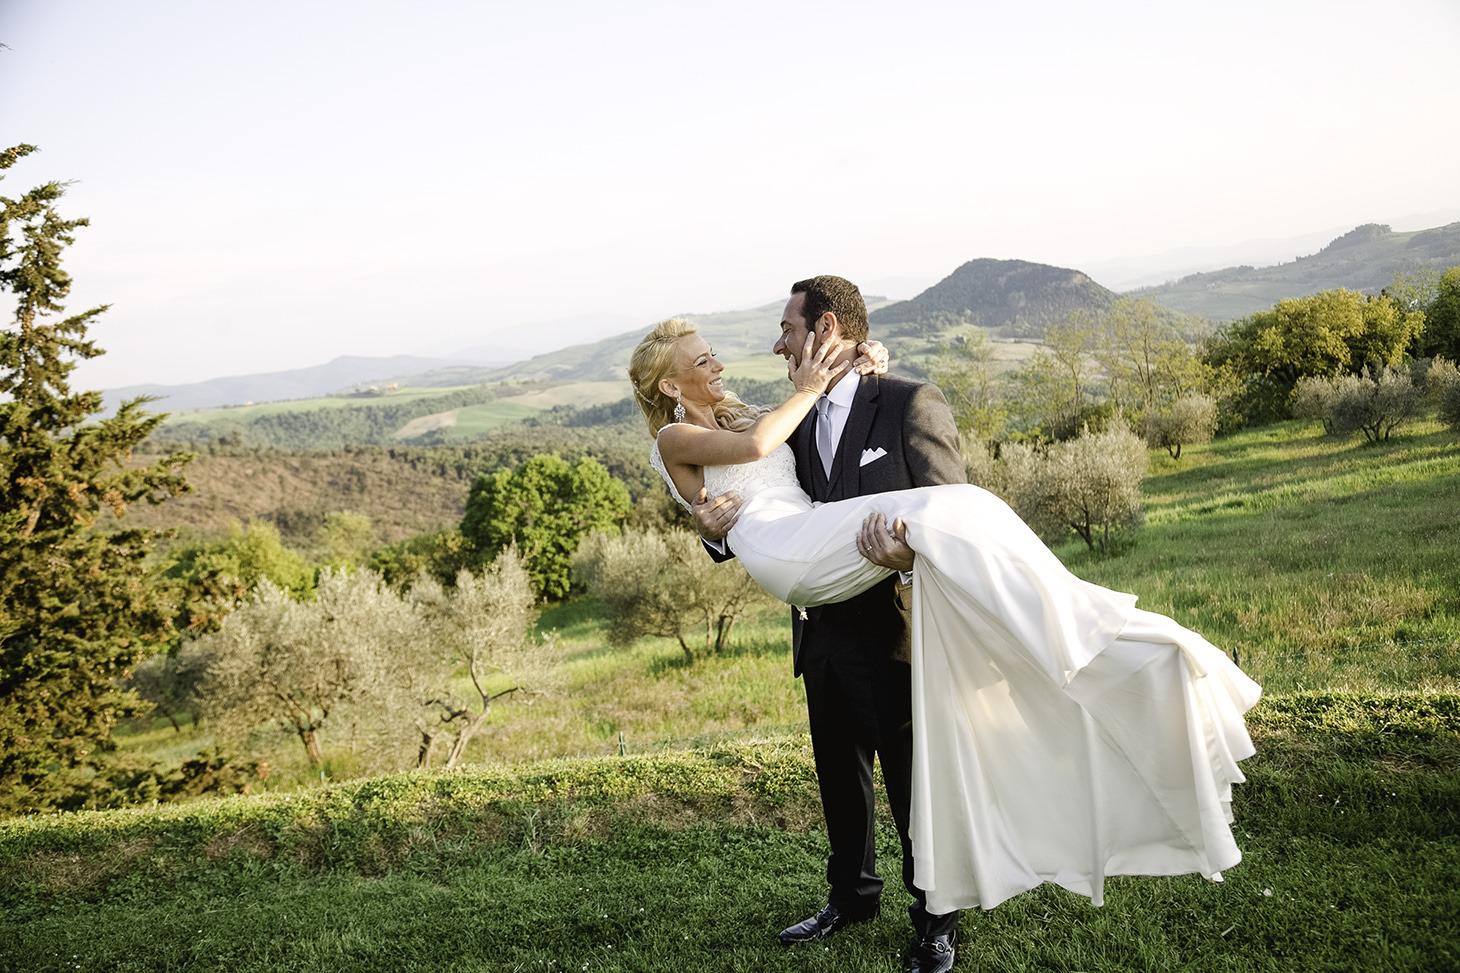 Frank & Jessica | S. Gimignano